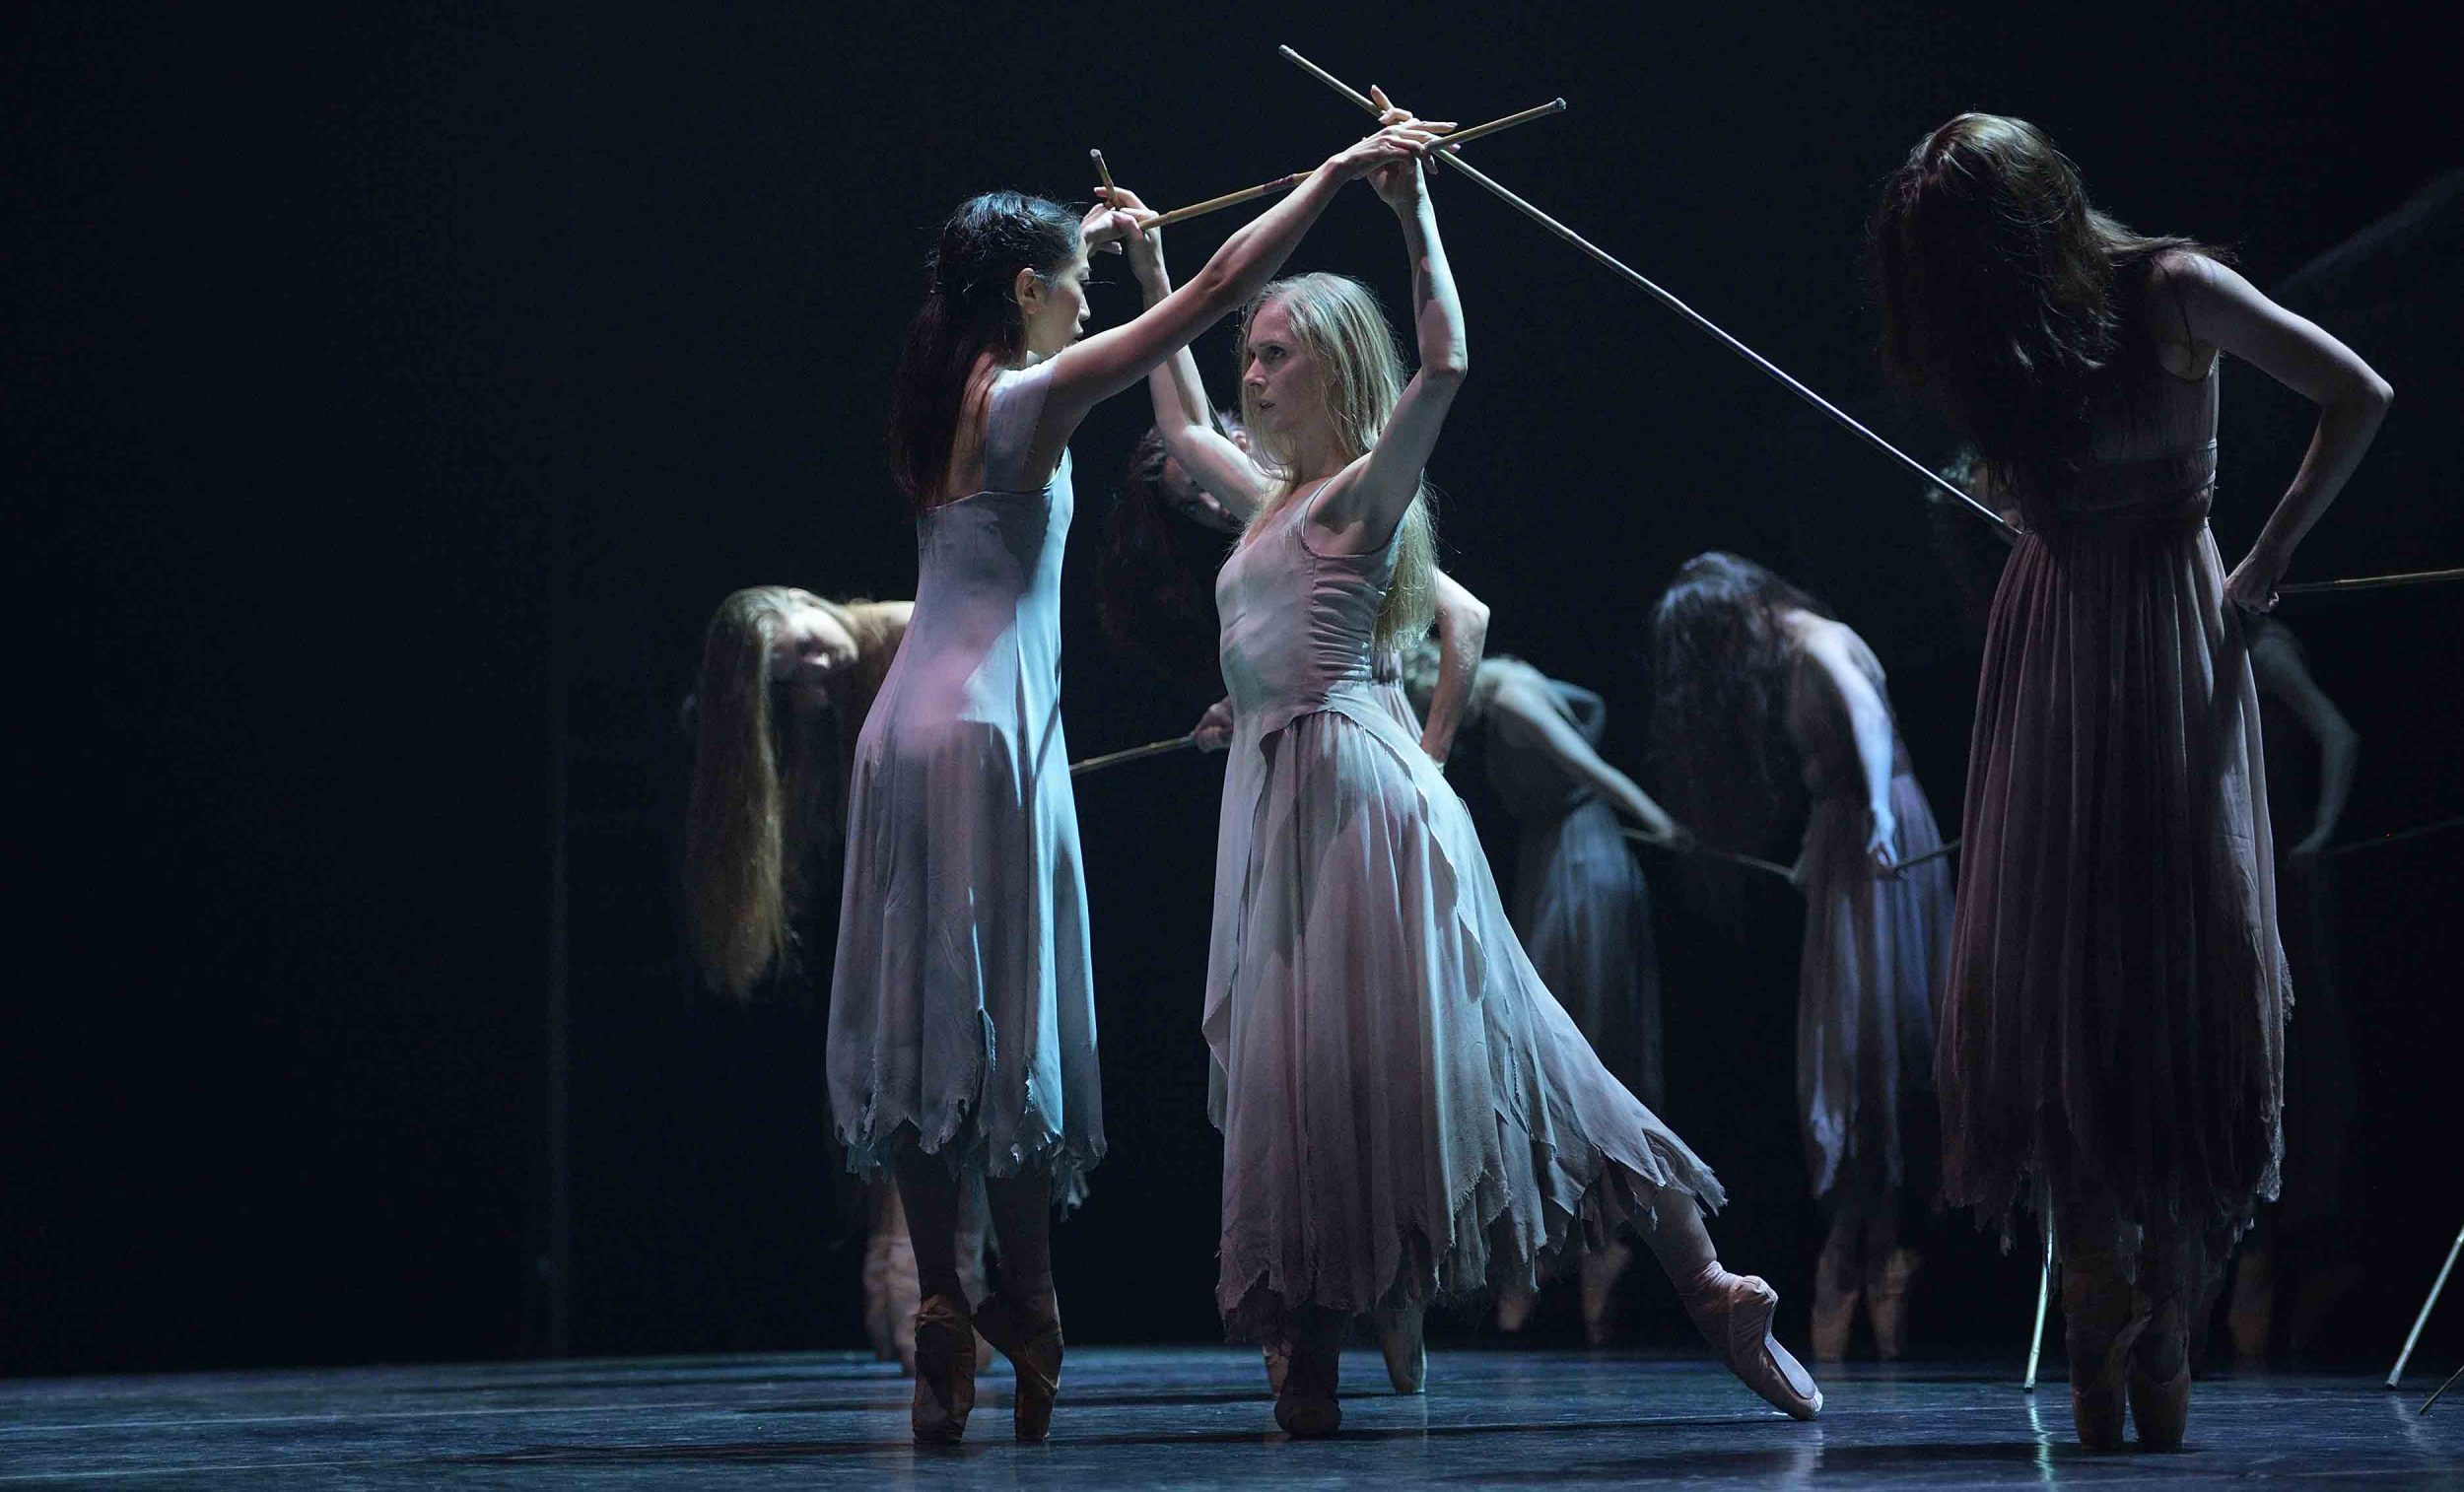 Stina-Quagebeur-and-Erina-Takahashi-in-Akram-Khan's-Giselle-(c)-Laurent-Liotardo-(5)